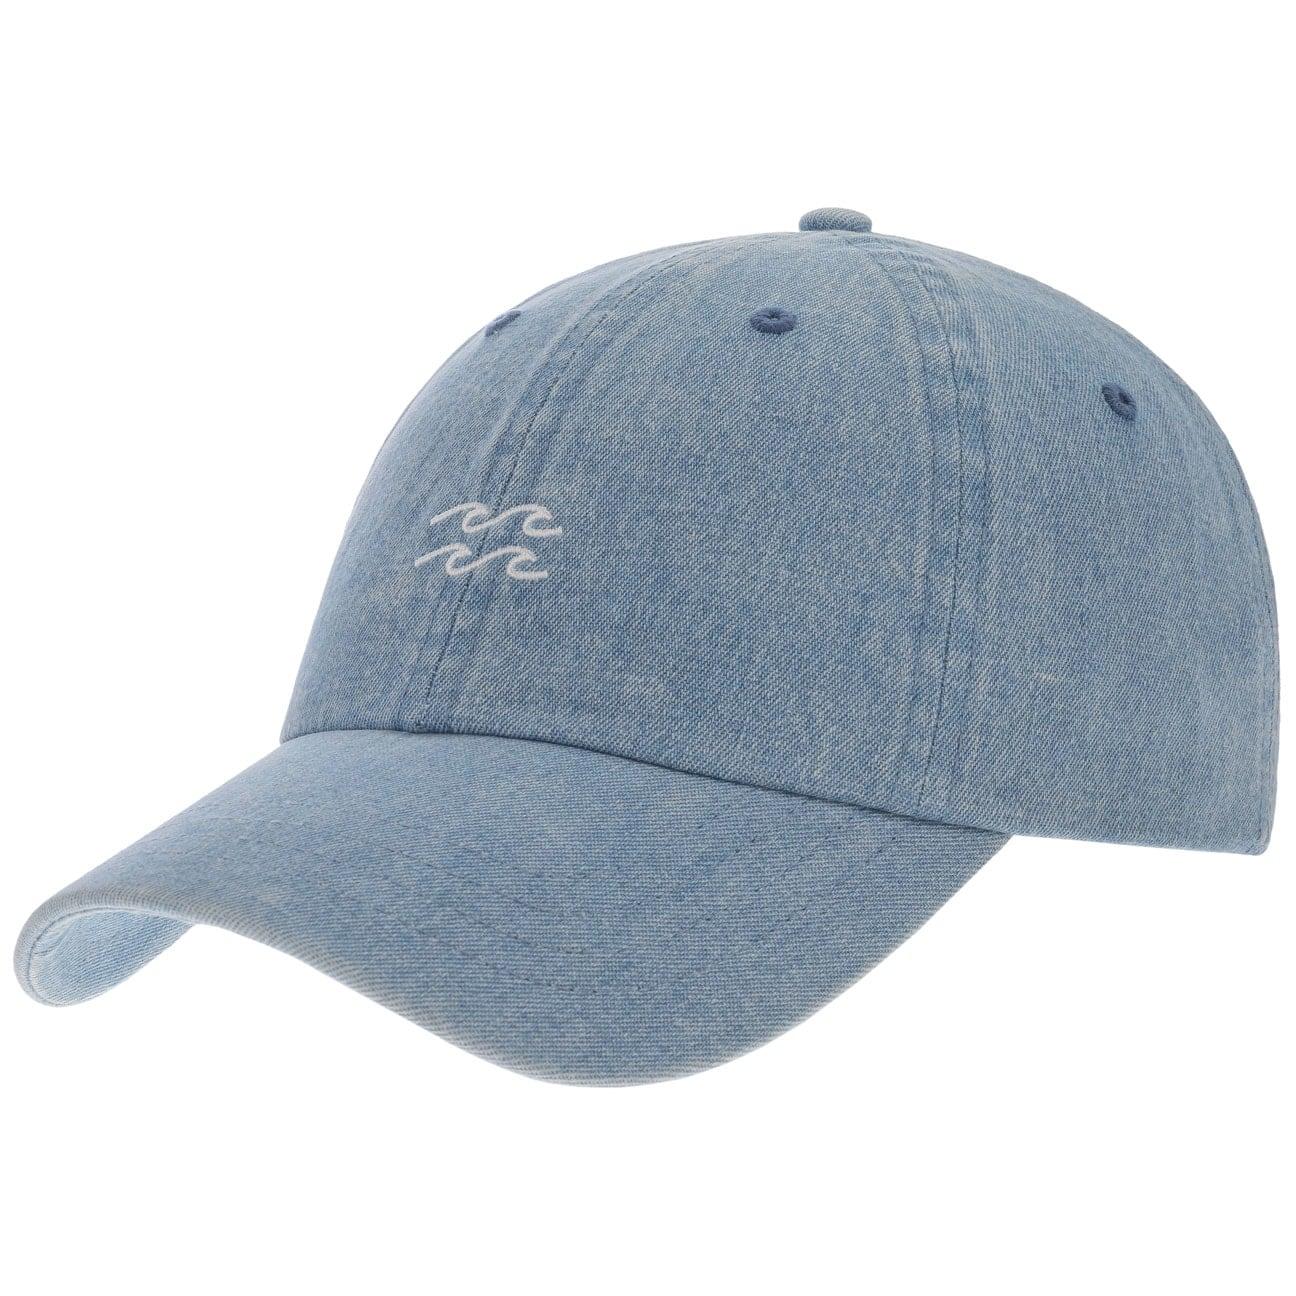 Casquette Stacked Denim Strapback by Billabong  baseball cap